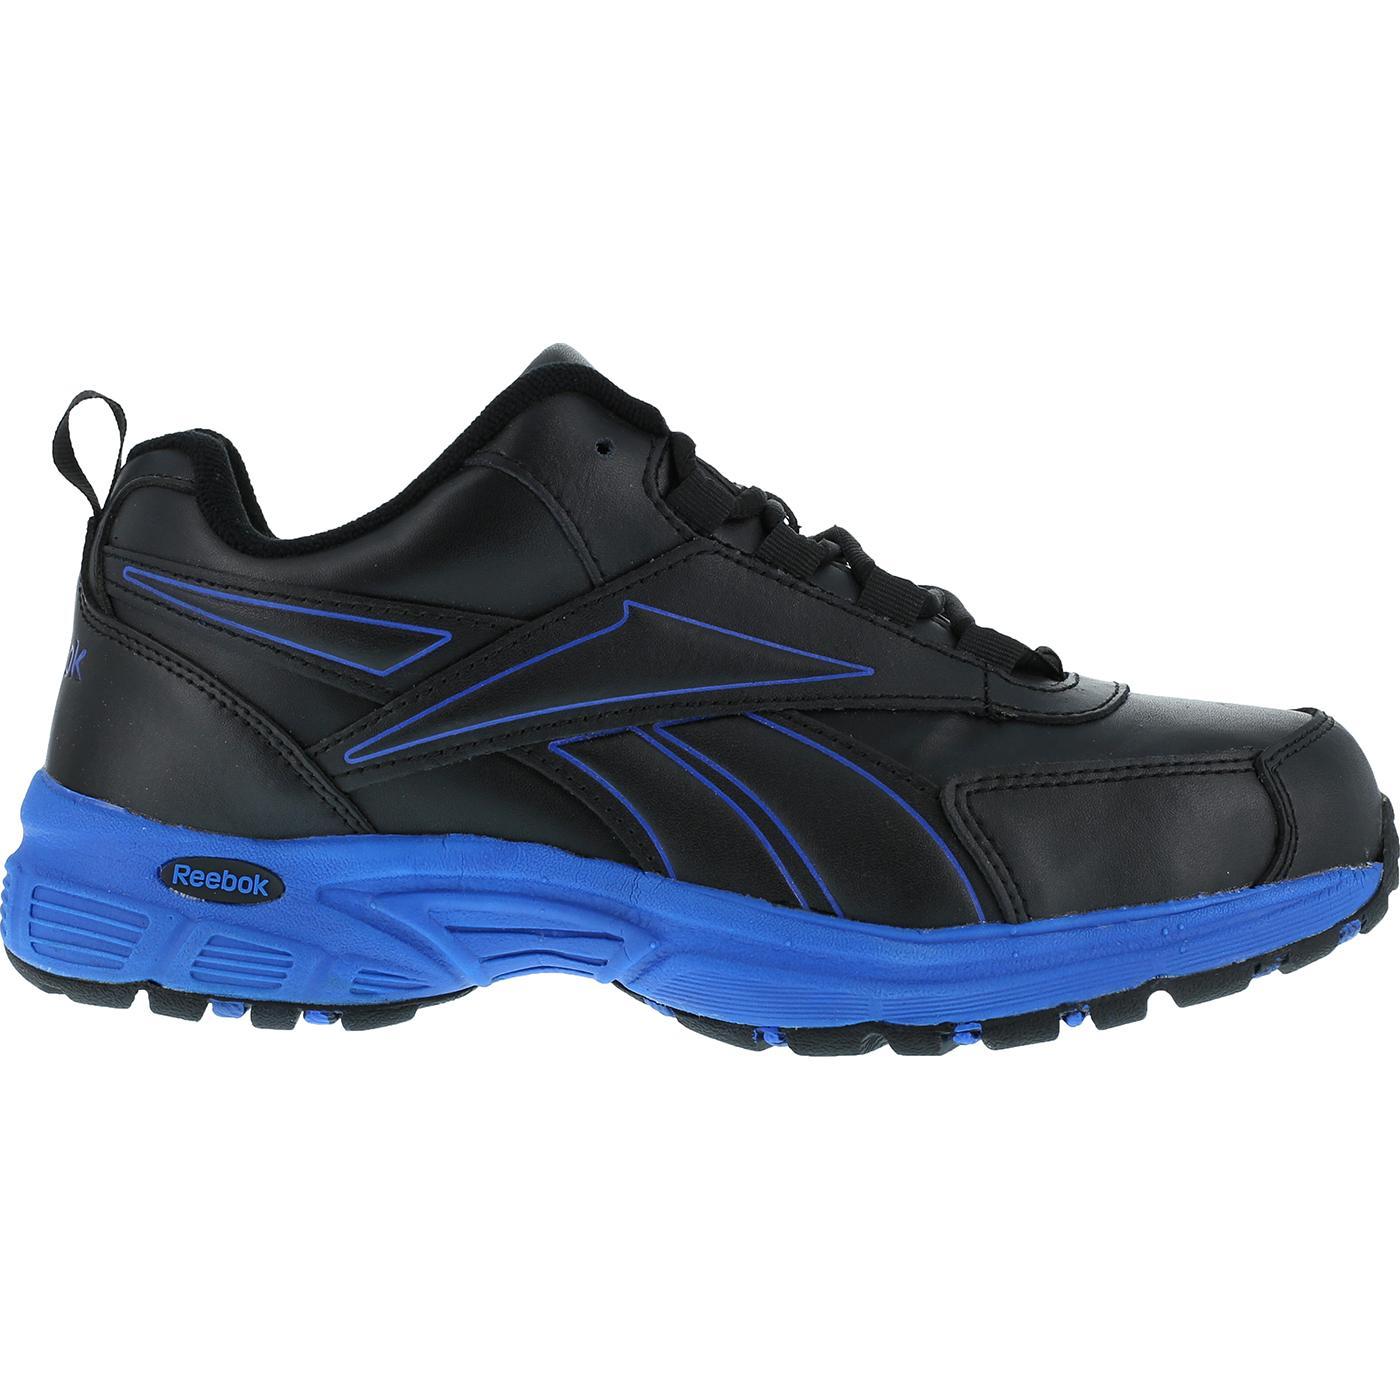 397d8467c2f Reebok Ateron Steel Toe Work Athletic Shoe